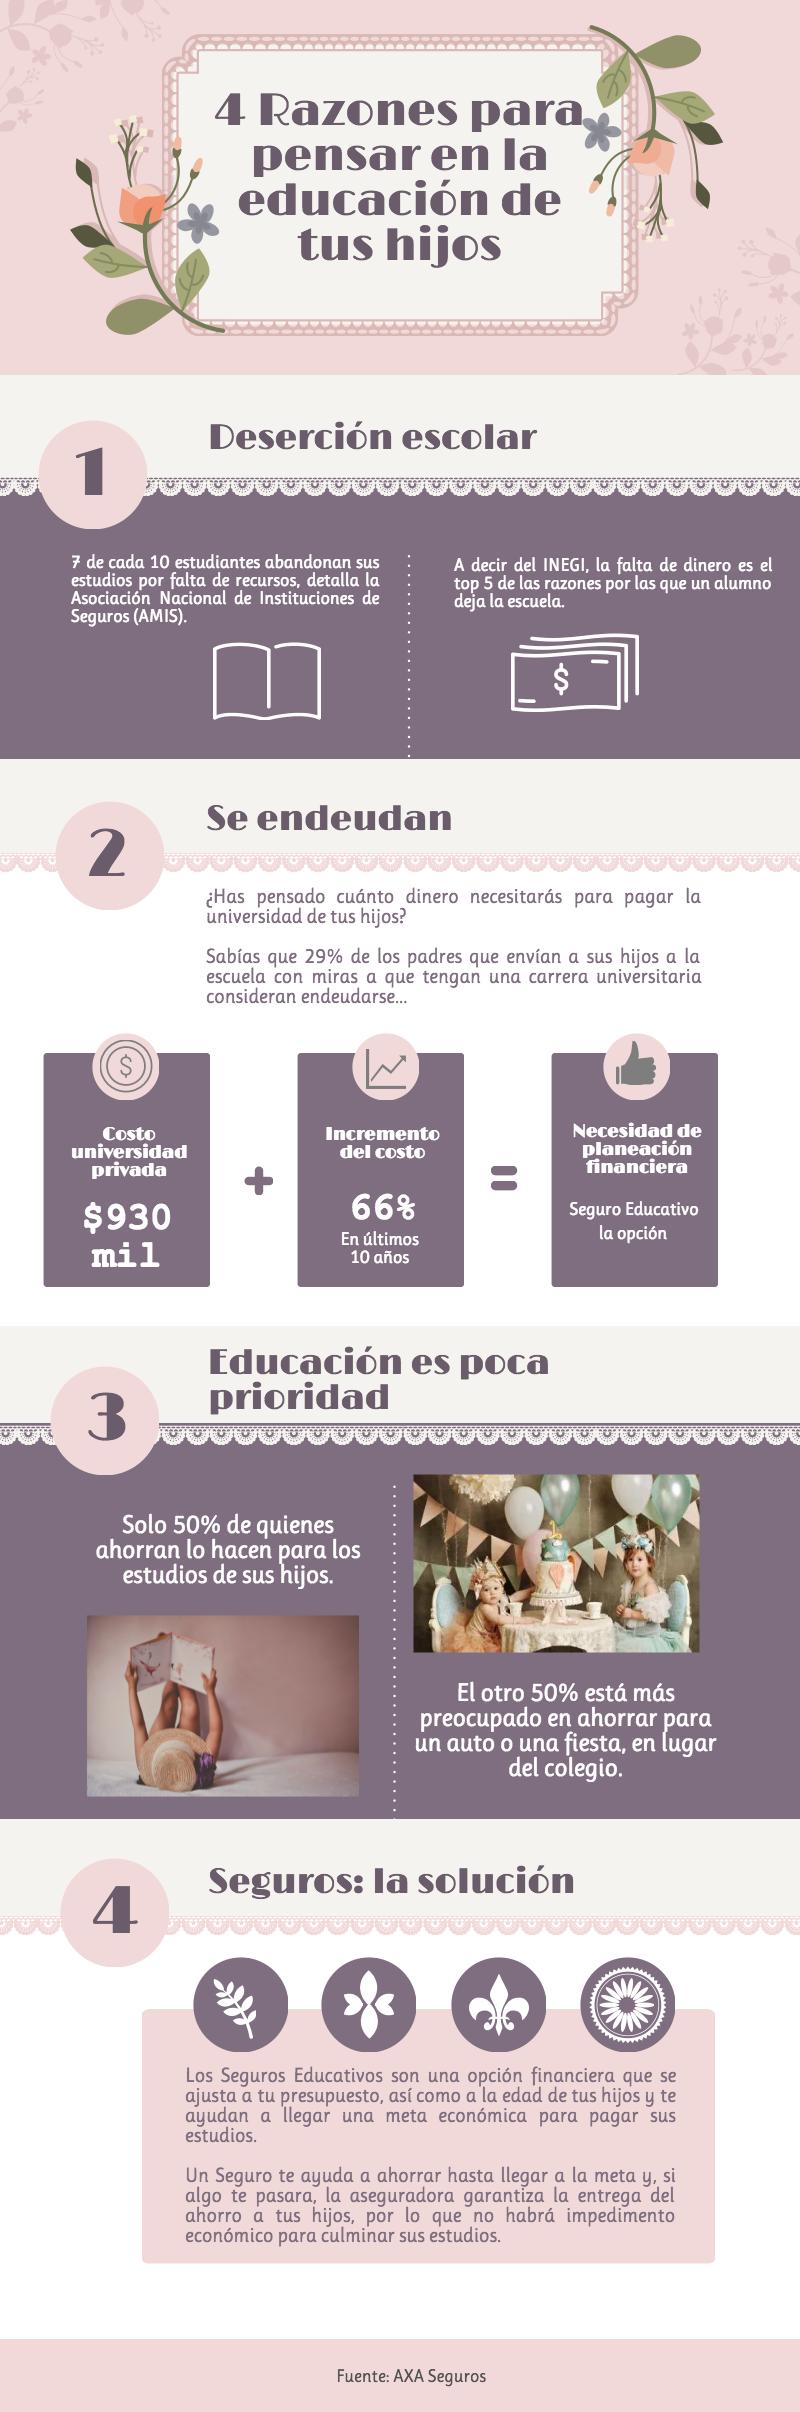 infografia-axa-educacion